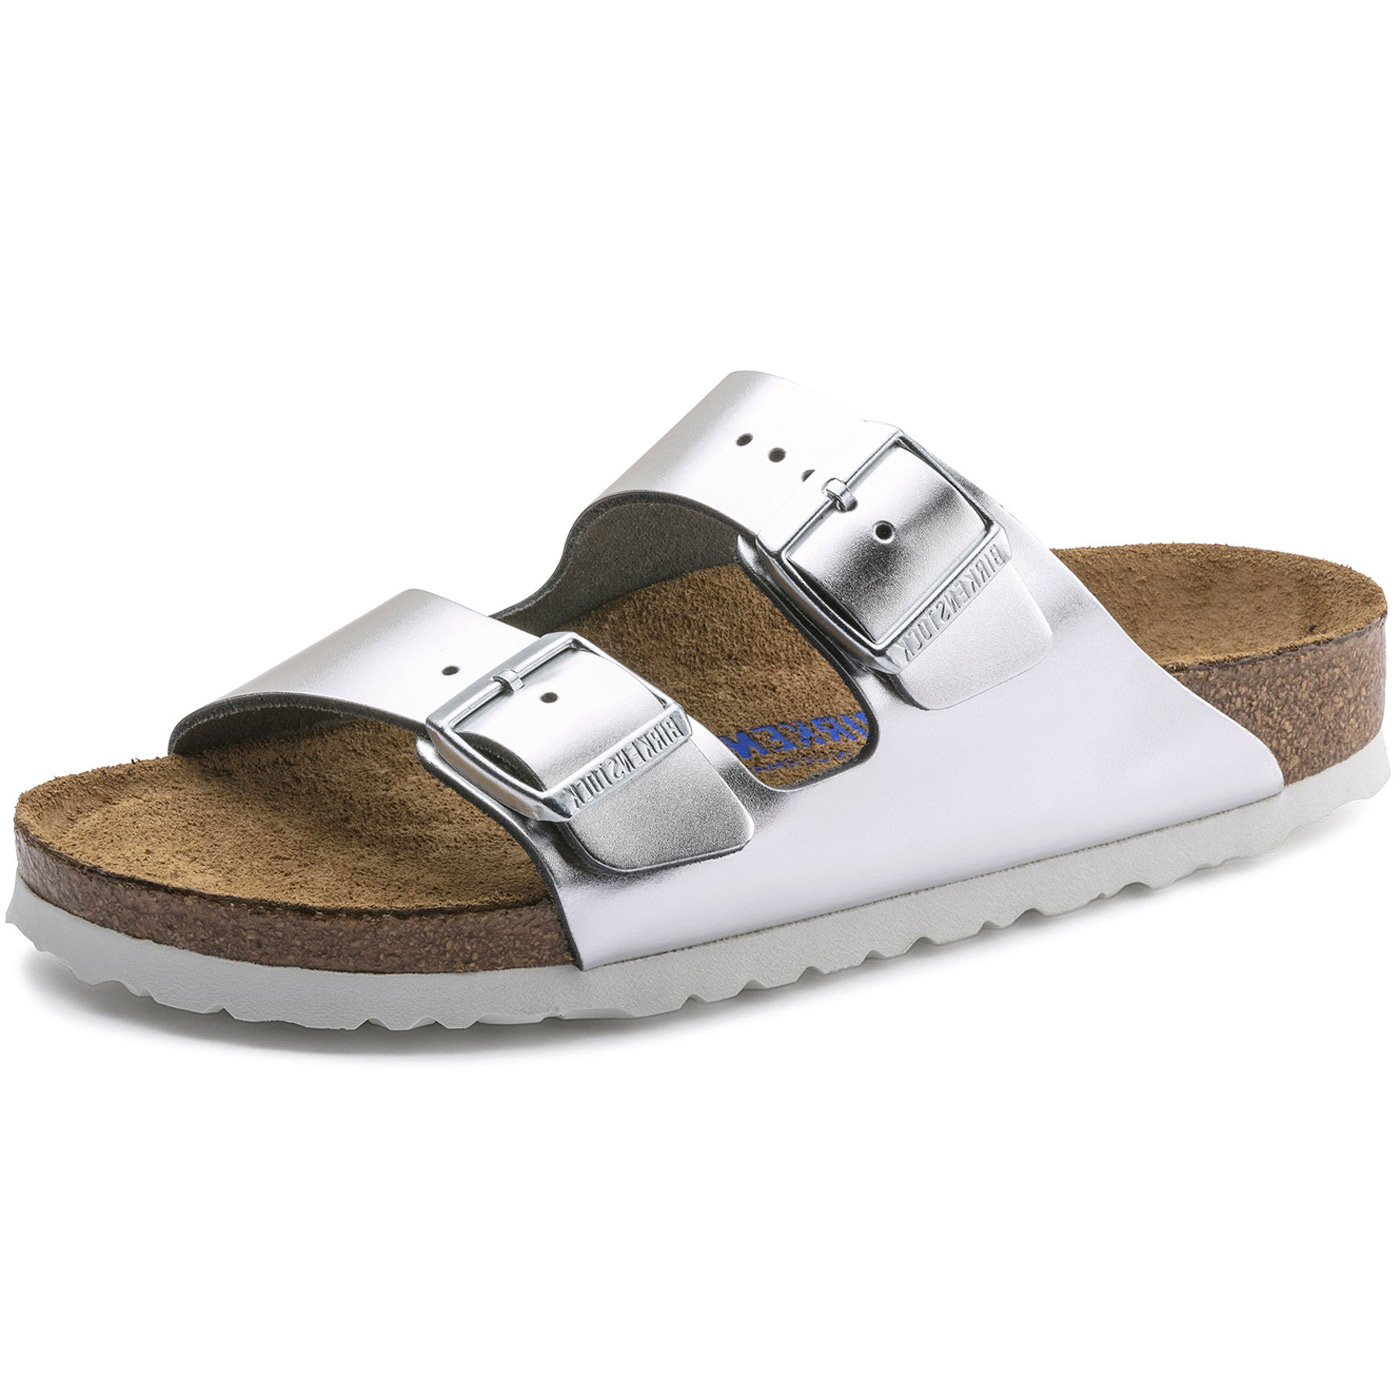 birkenstock arizona soft footbed women sandal silver mules clogs women flux online. Black Bedroom Furniture Sets. Home Design Ideas